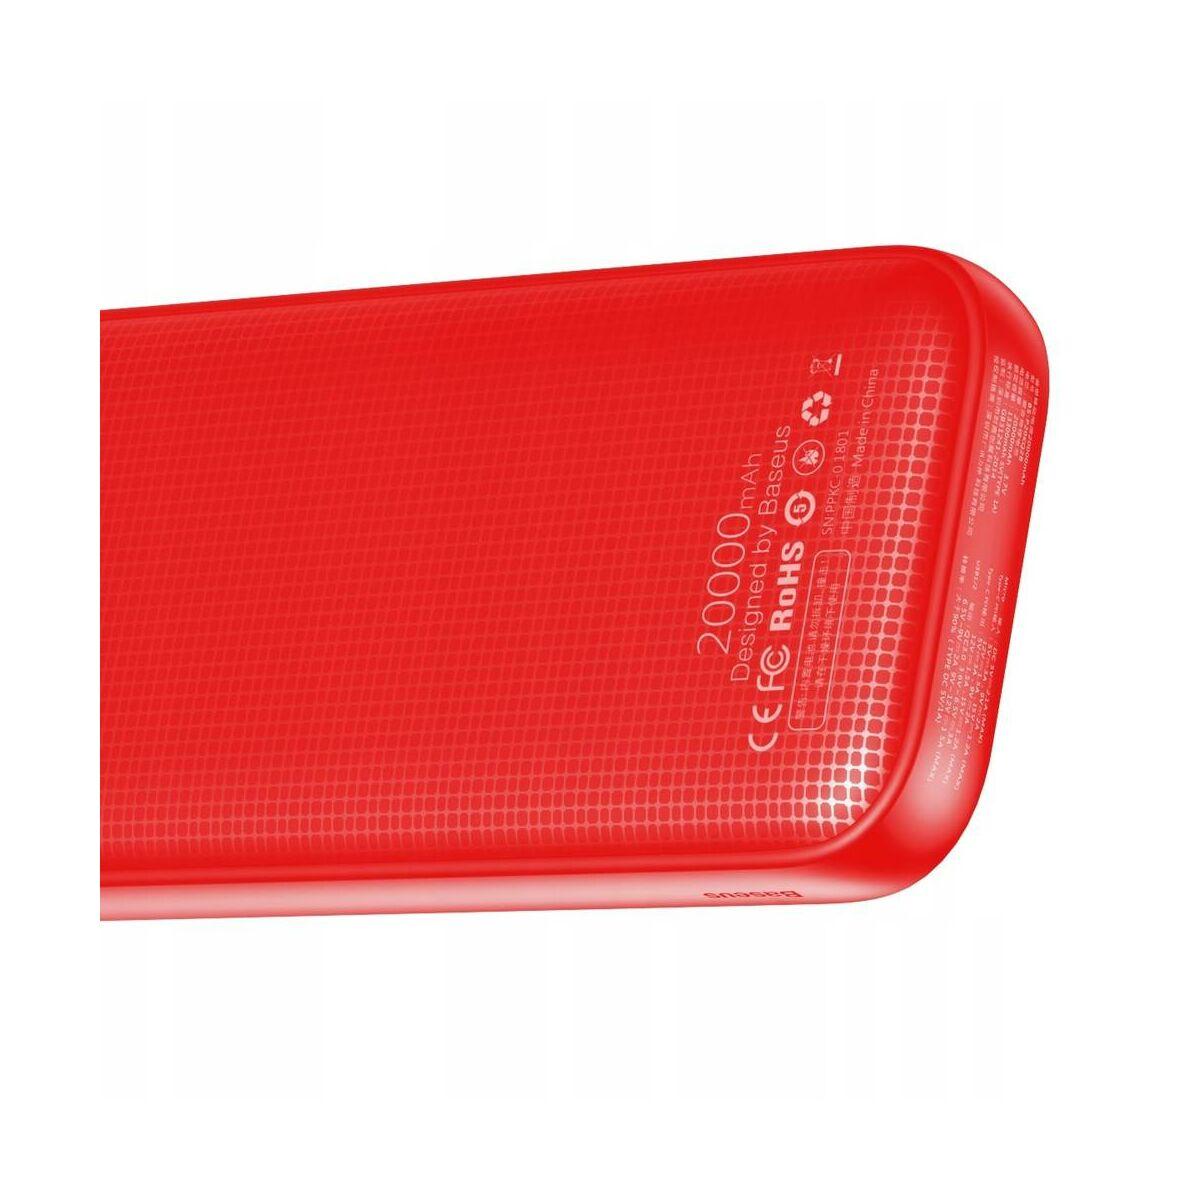 Baseus Power Bank Powerful (Micro USB + Type-C bemenet / dupla USB + Type-C PD kimenet), 2.4A, 20.000 mAh, piros (PPKC-A09)